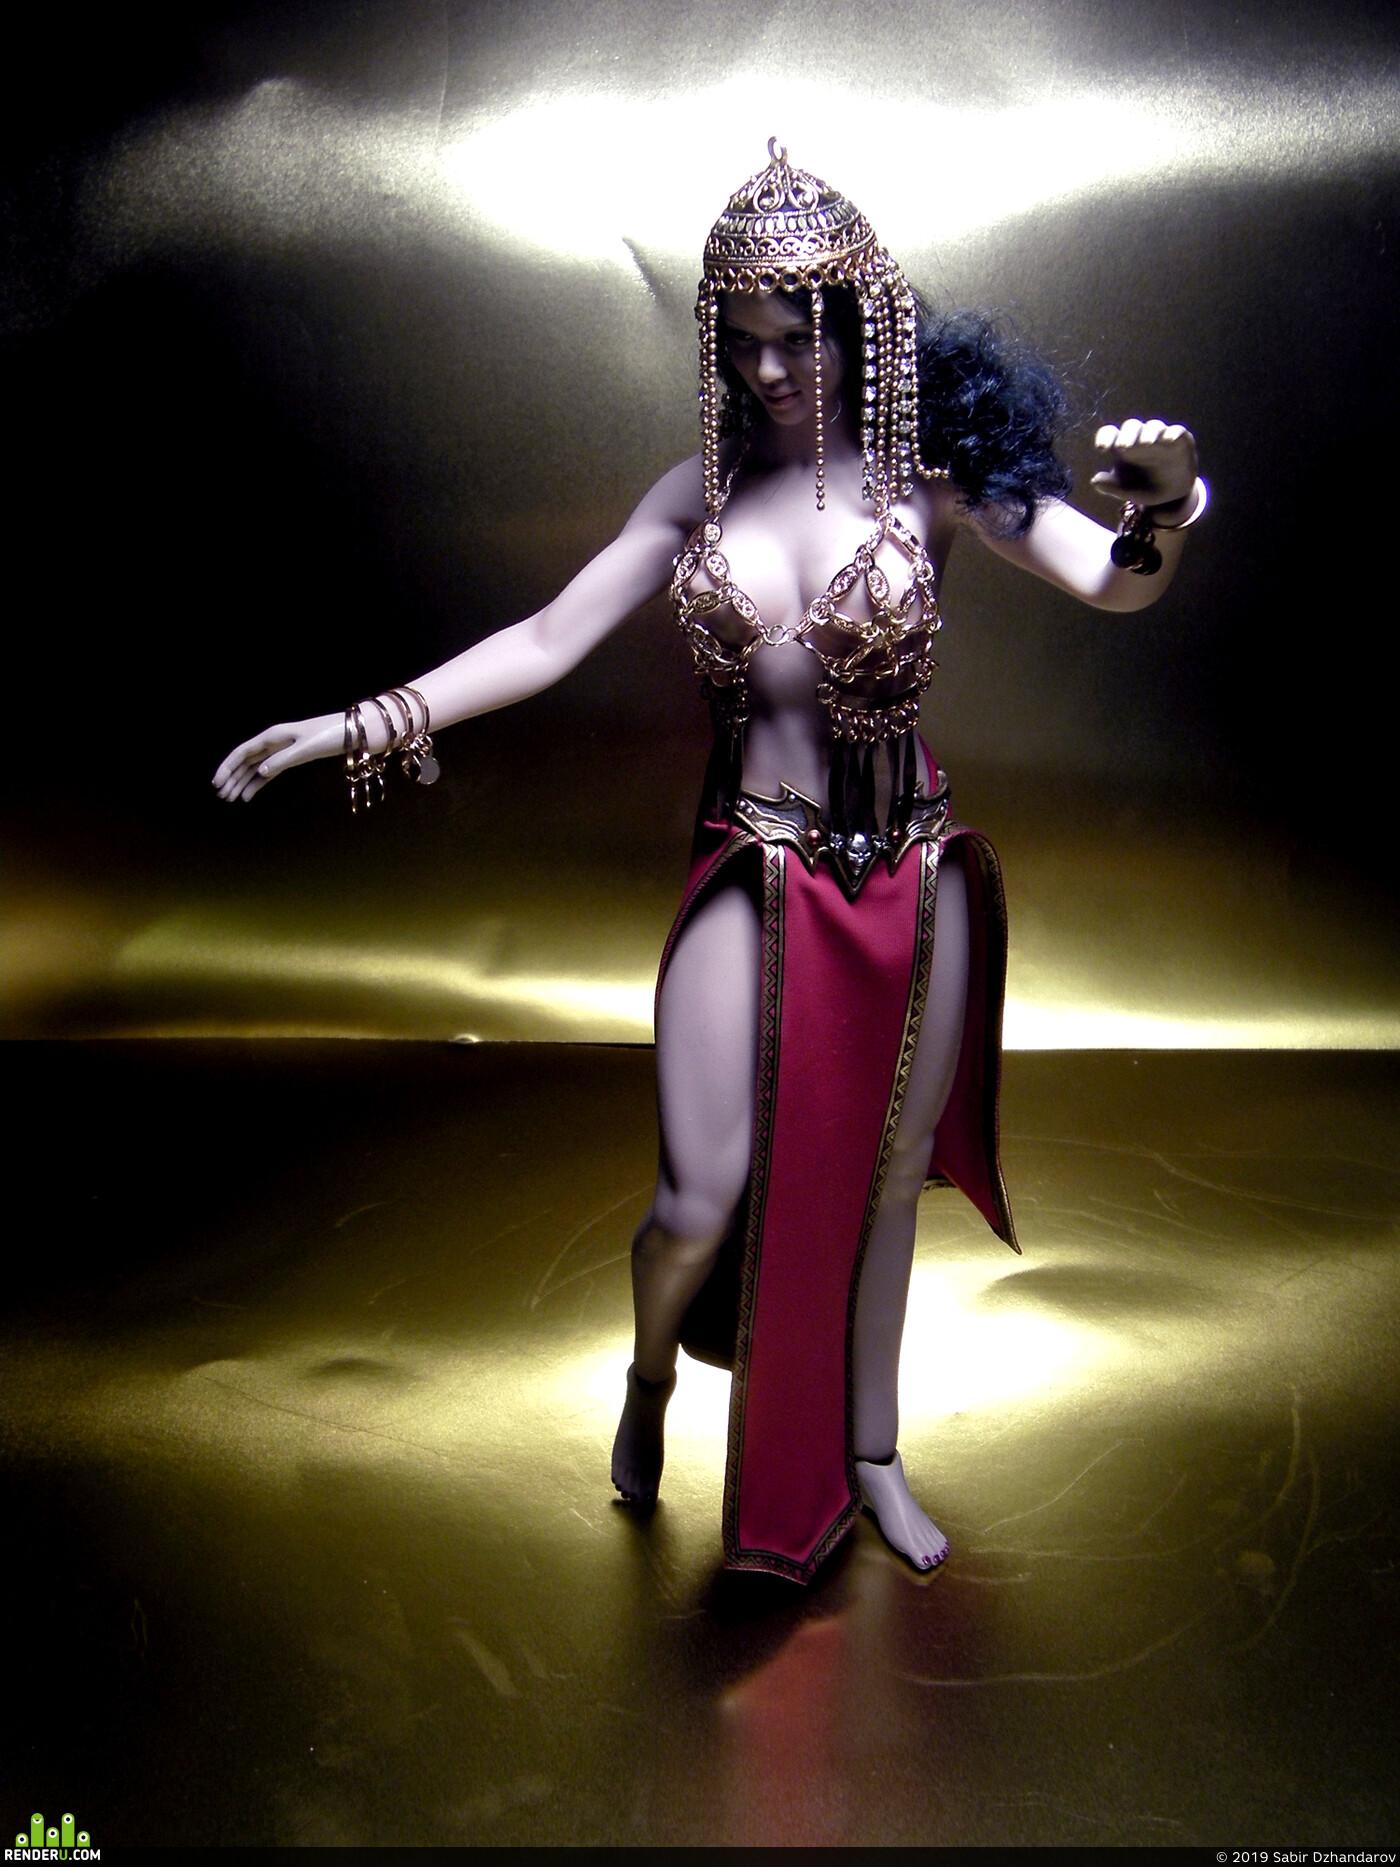 kostume, metall, костюм